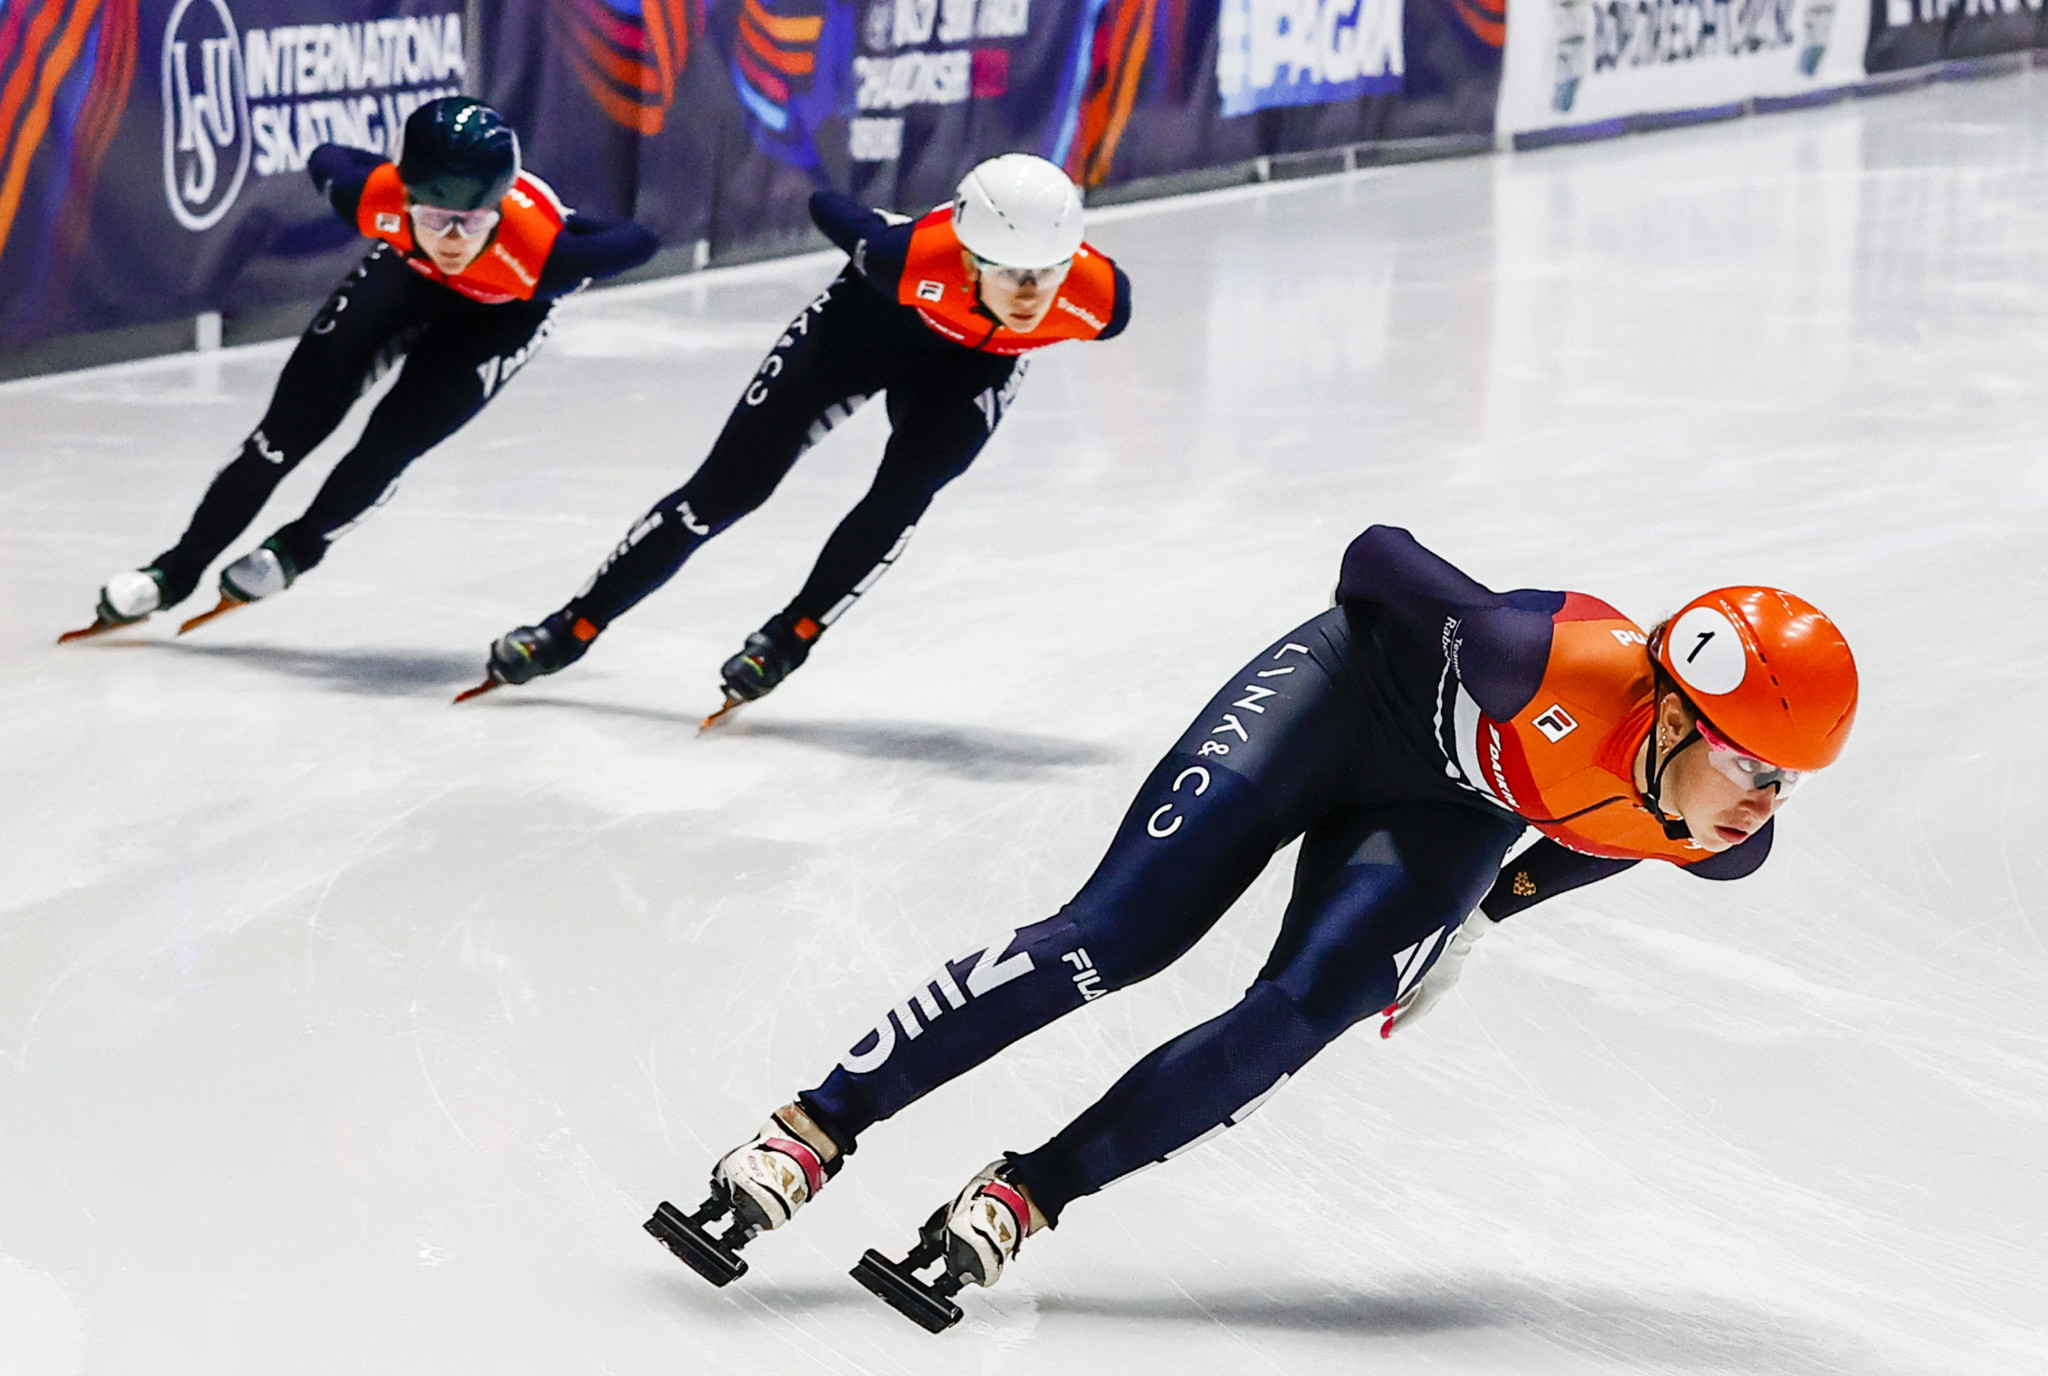 Qualifying races open World Short Track Speed Skating Championships in Dordrecht